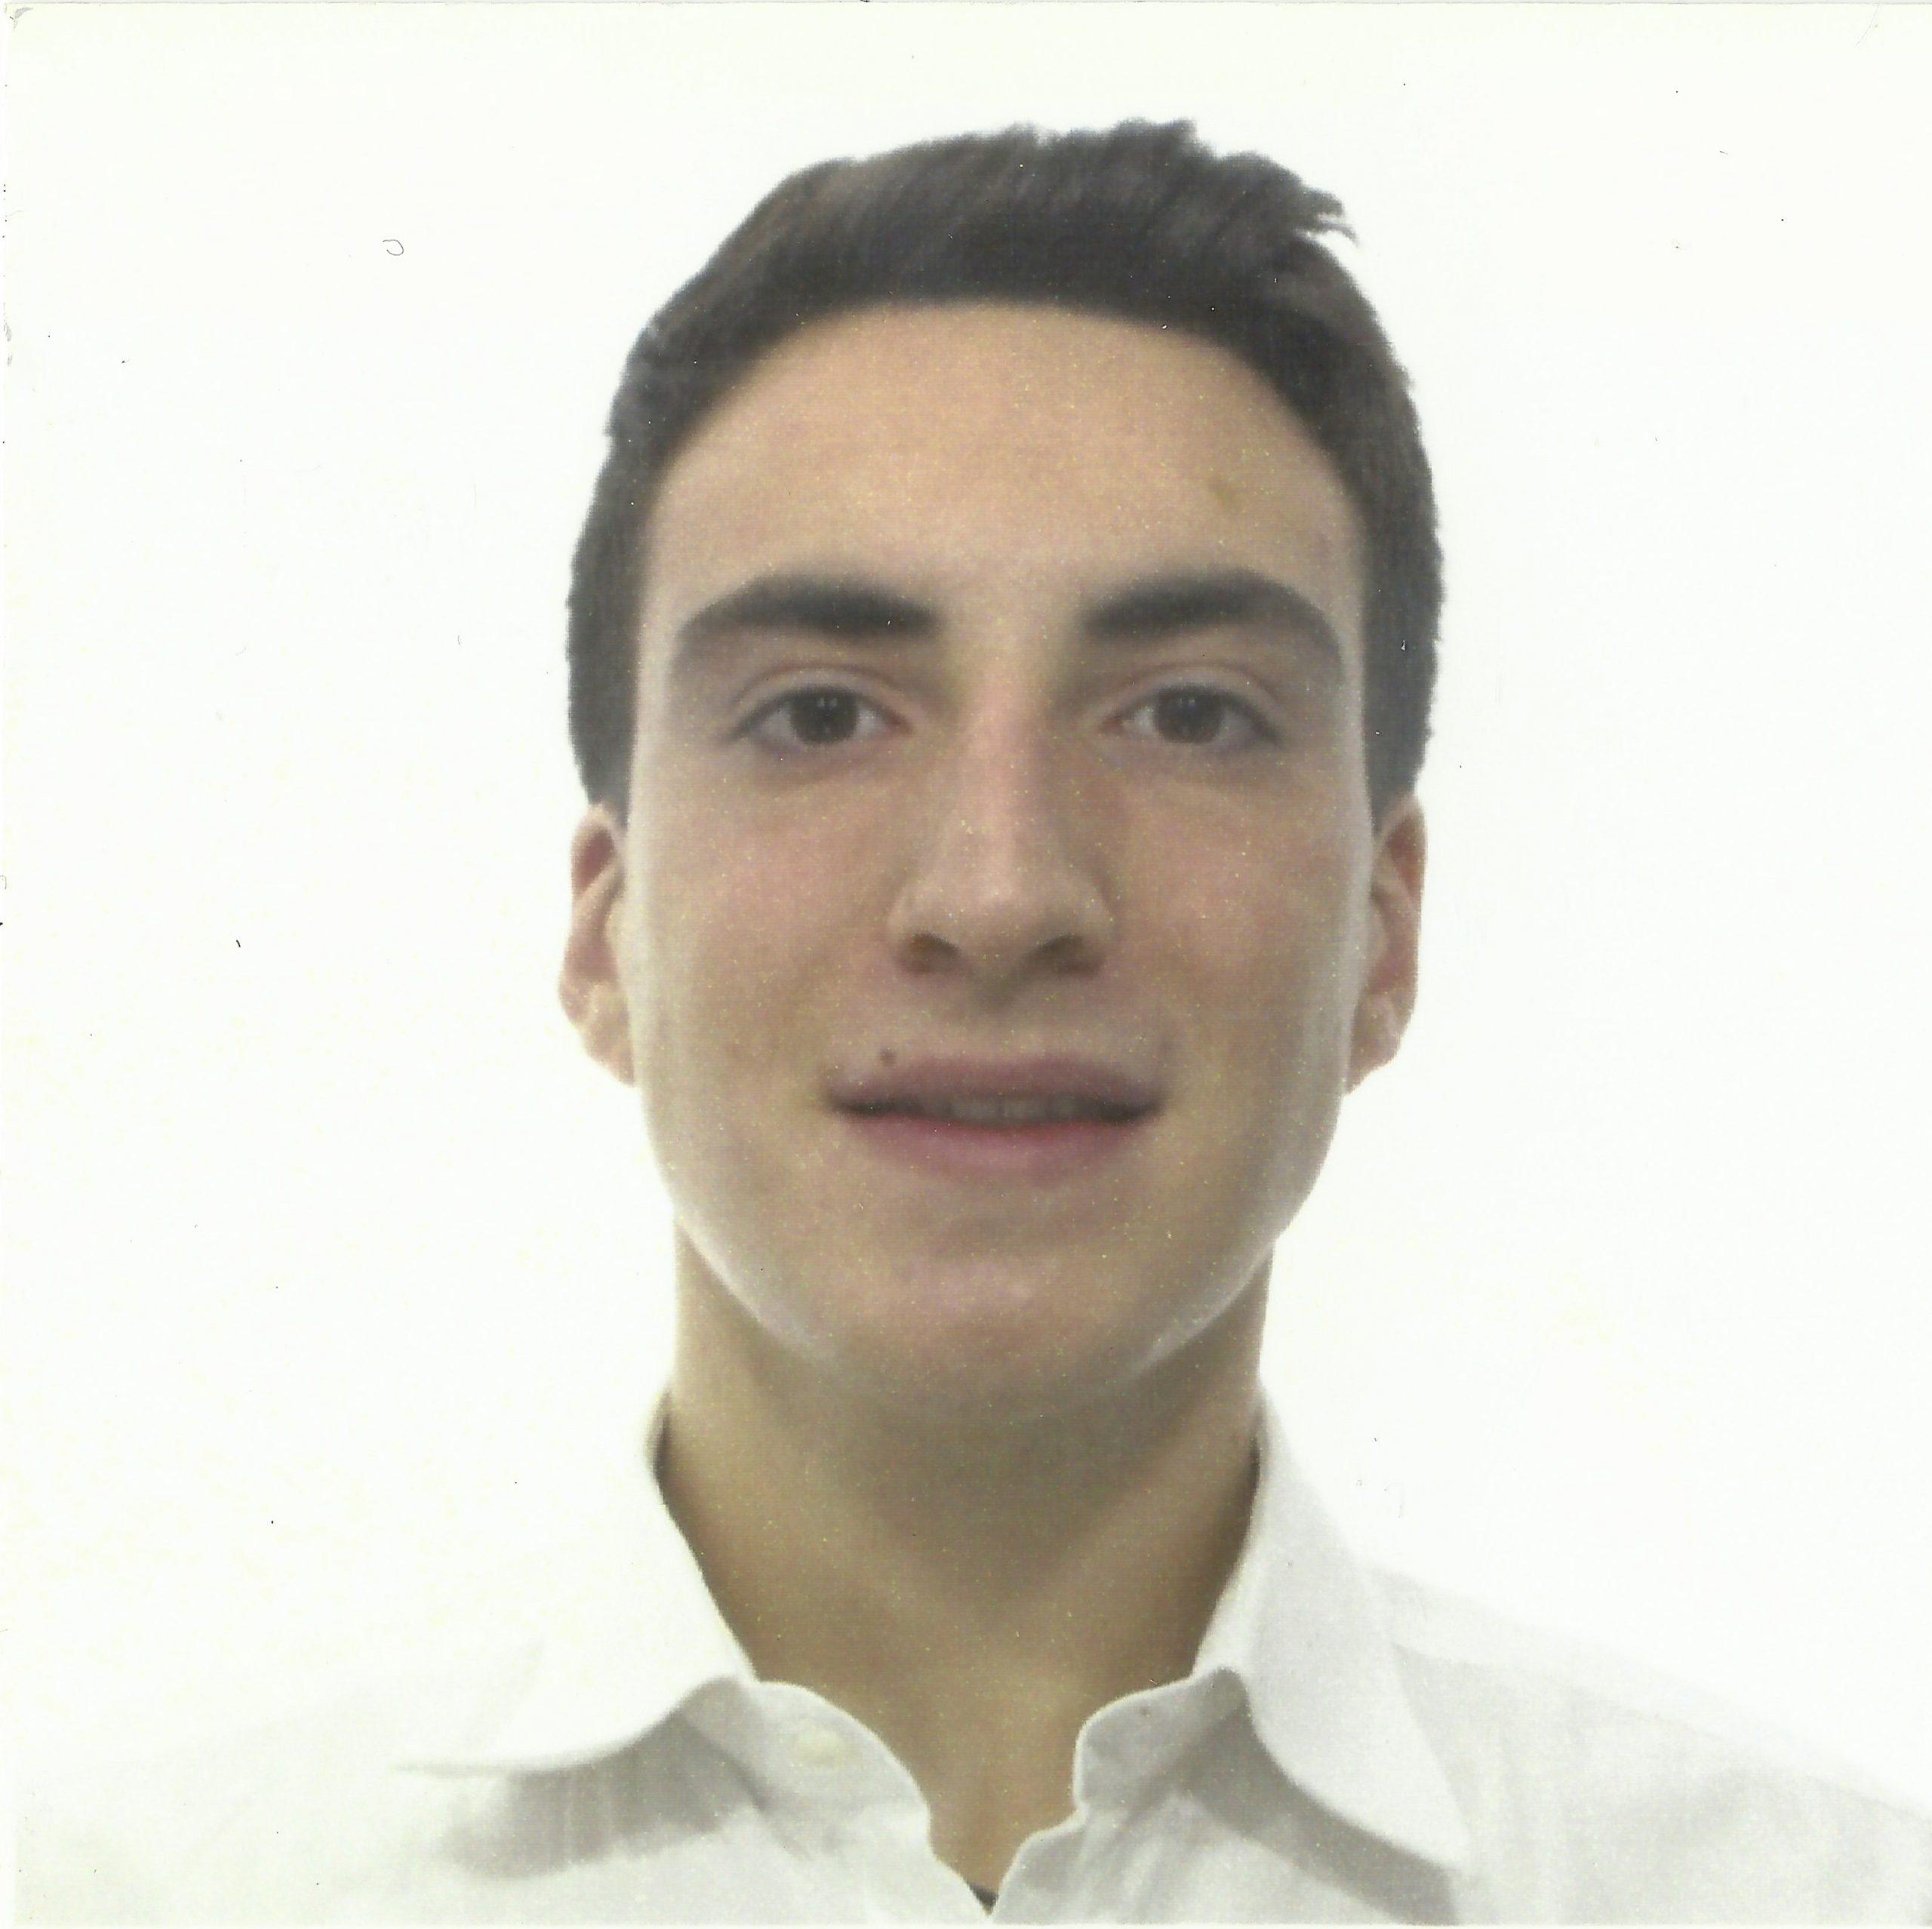 Manuel Guariglia